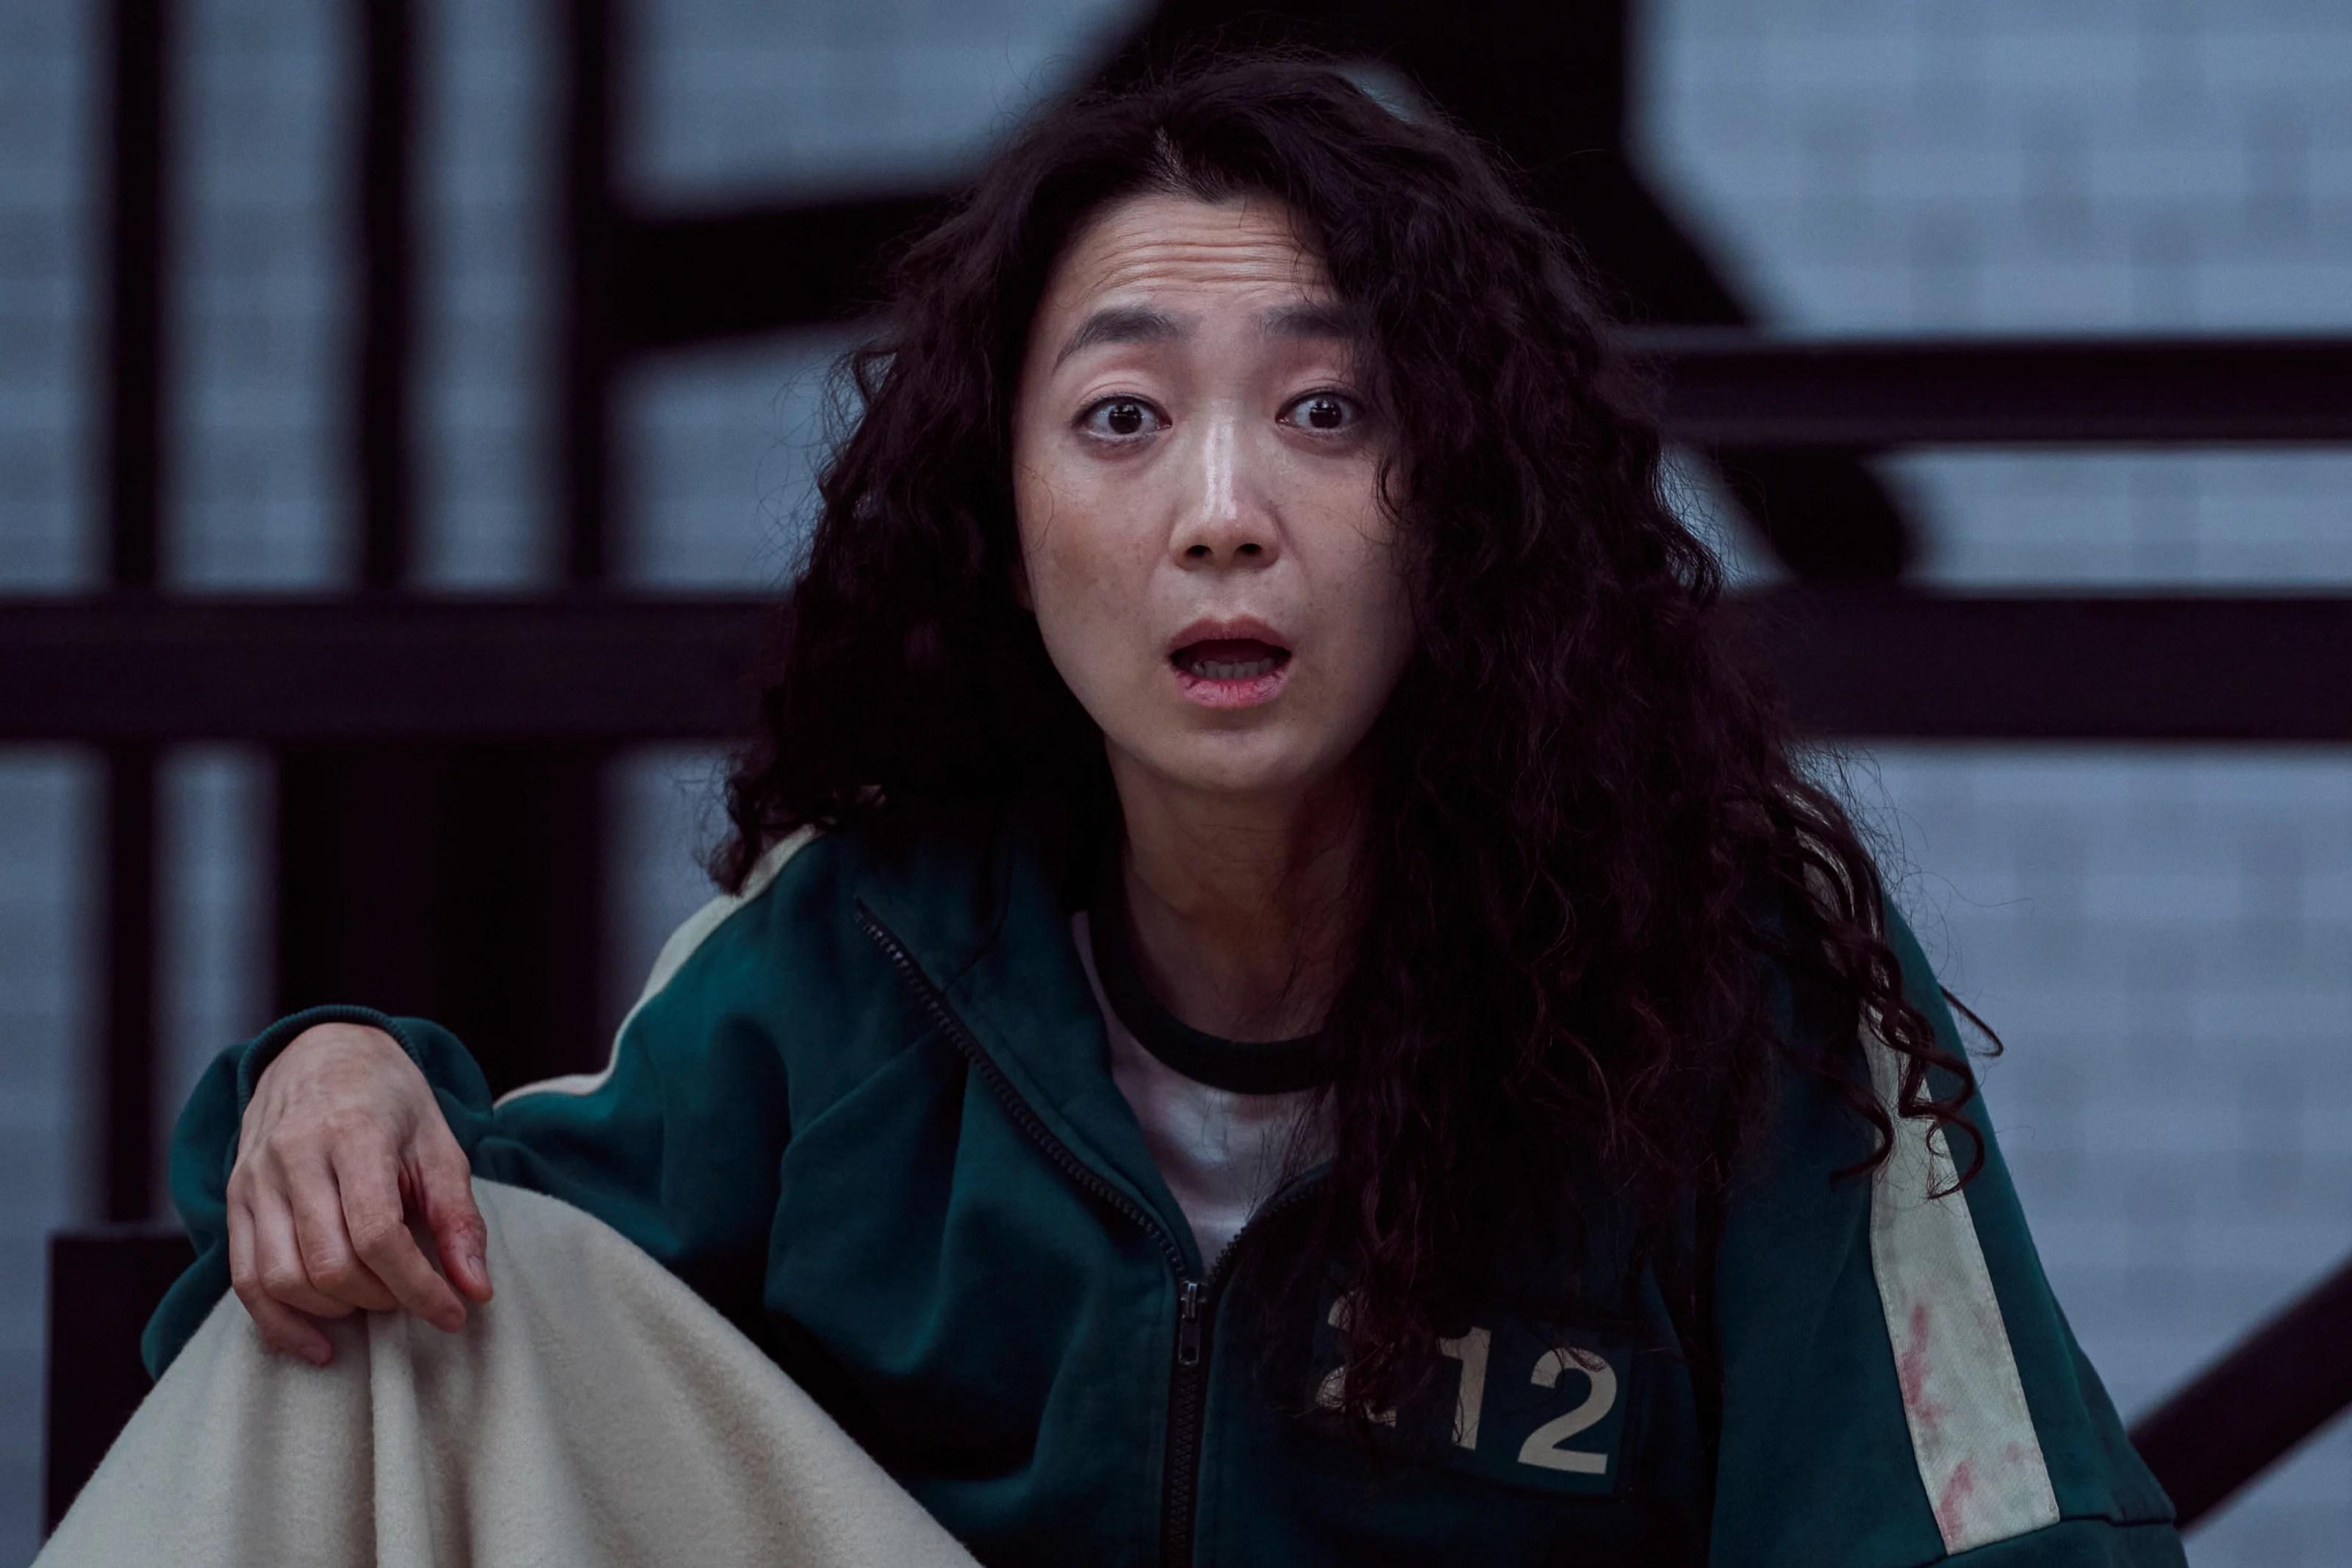 El elenco de Squid Game, Kim Joo-ryung